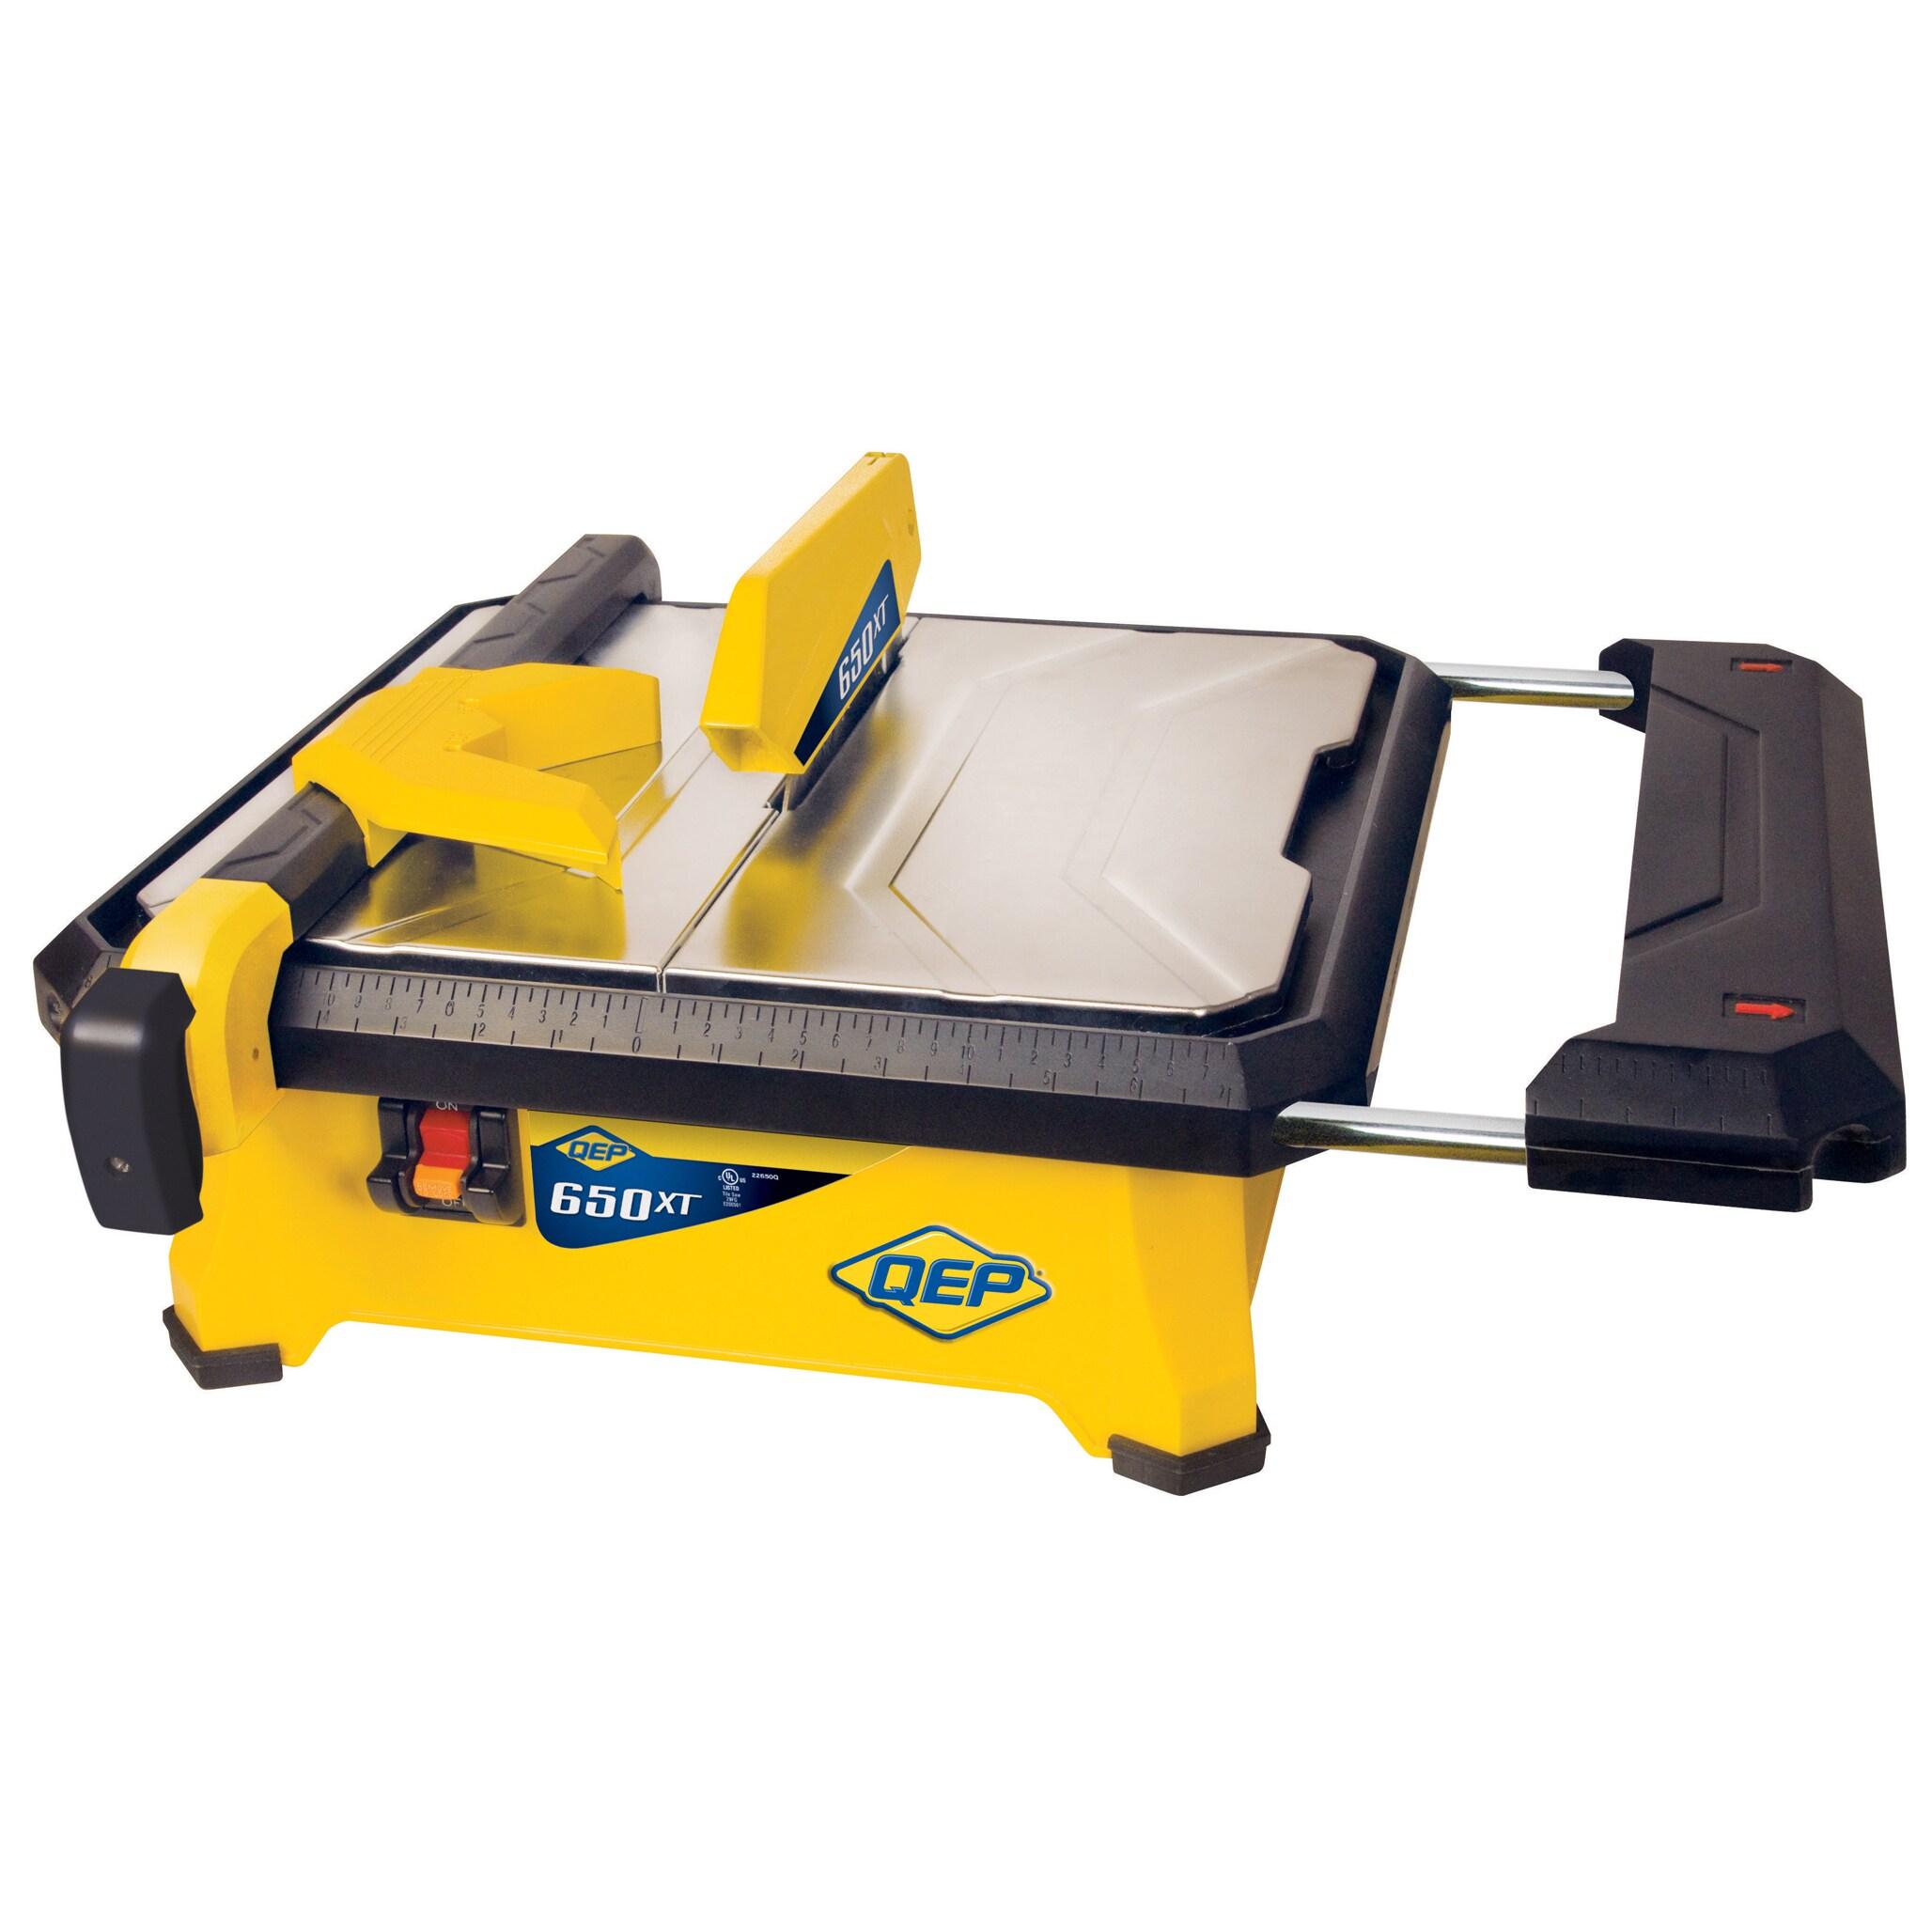 "Qep 22650Q 7"" Tile Wet Saw (Yard care hand tools), Multi"